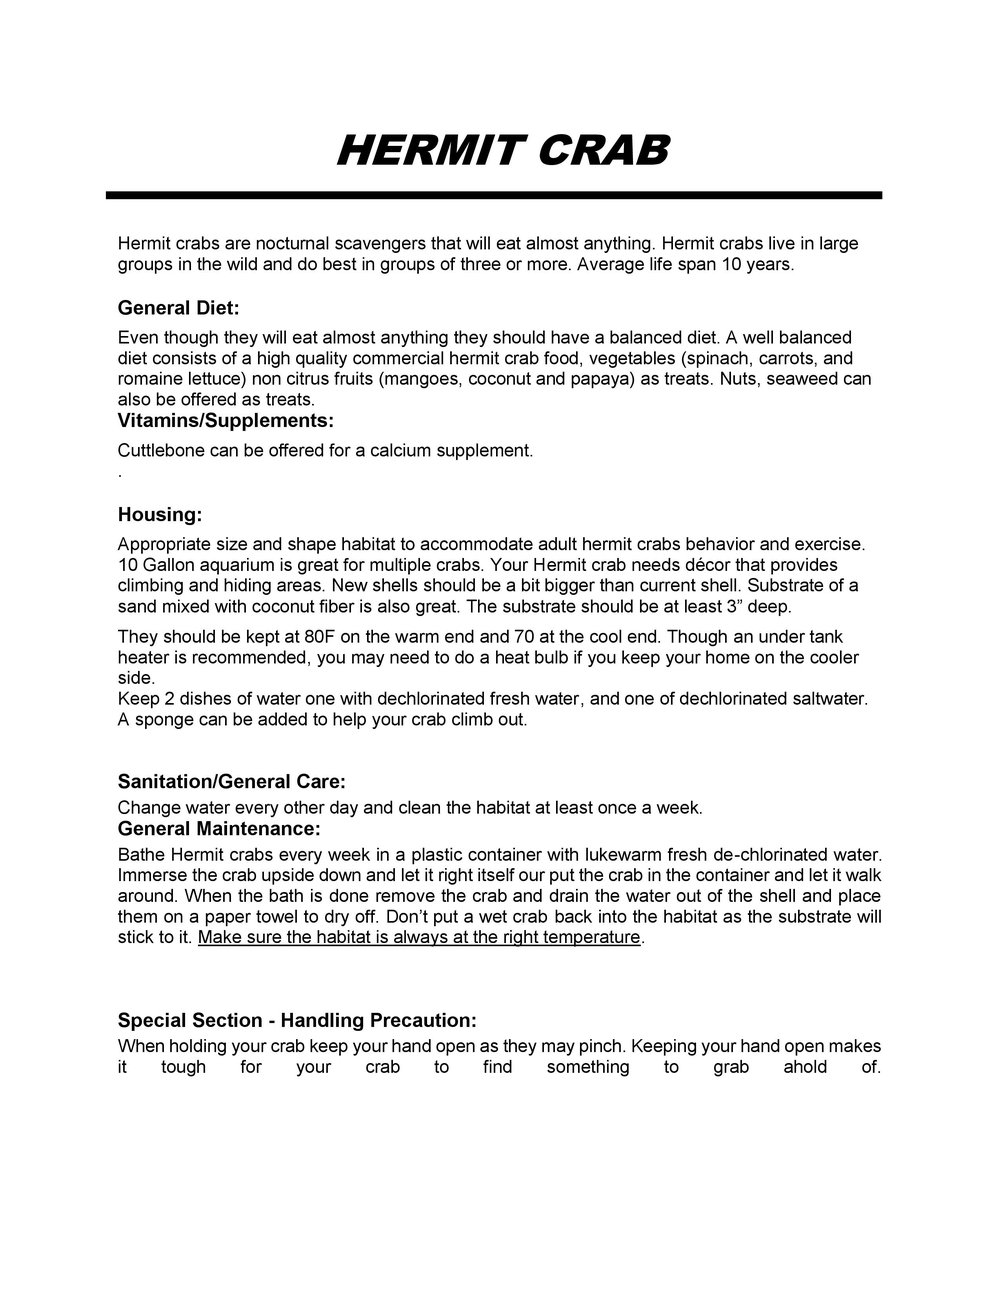 Hermit Crab Care Sheet pg1